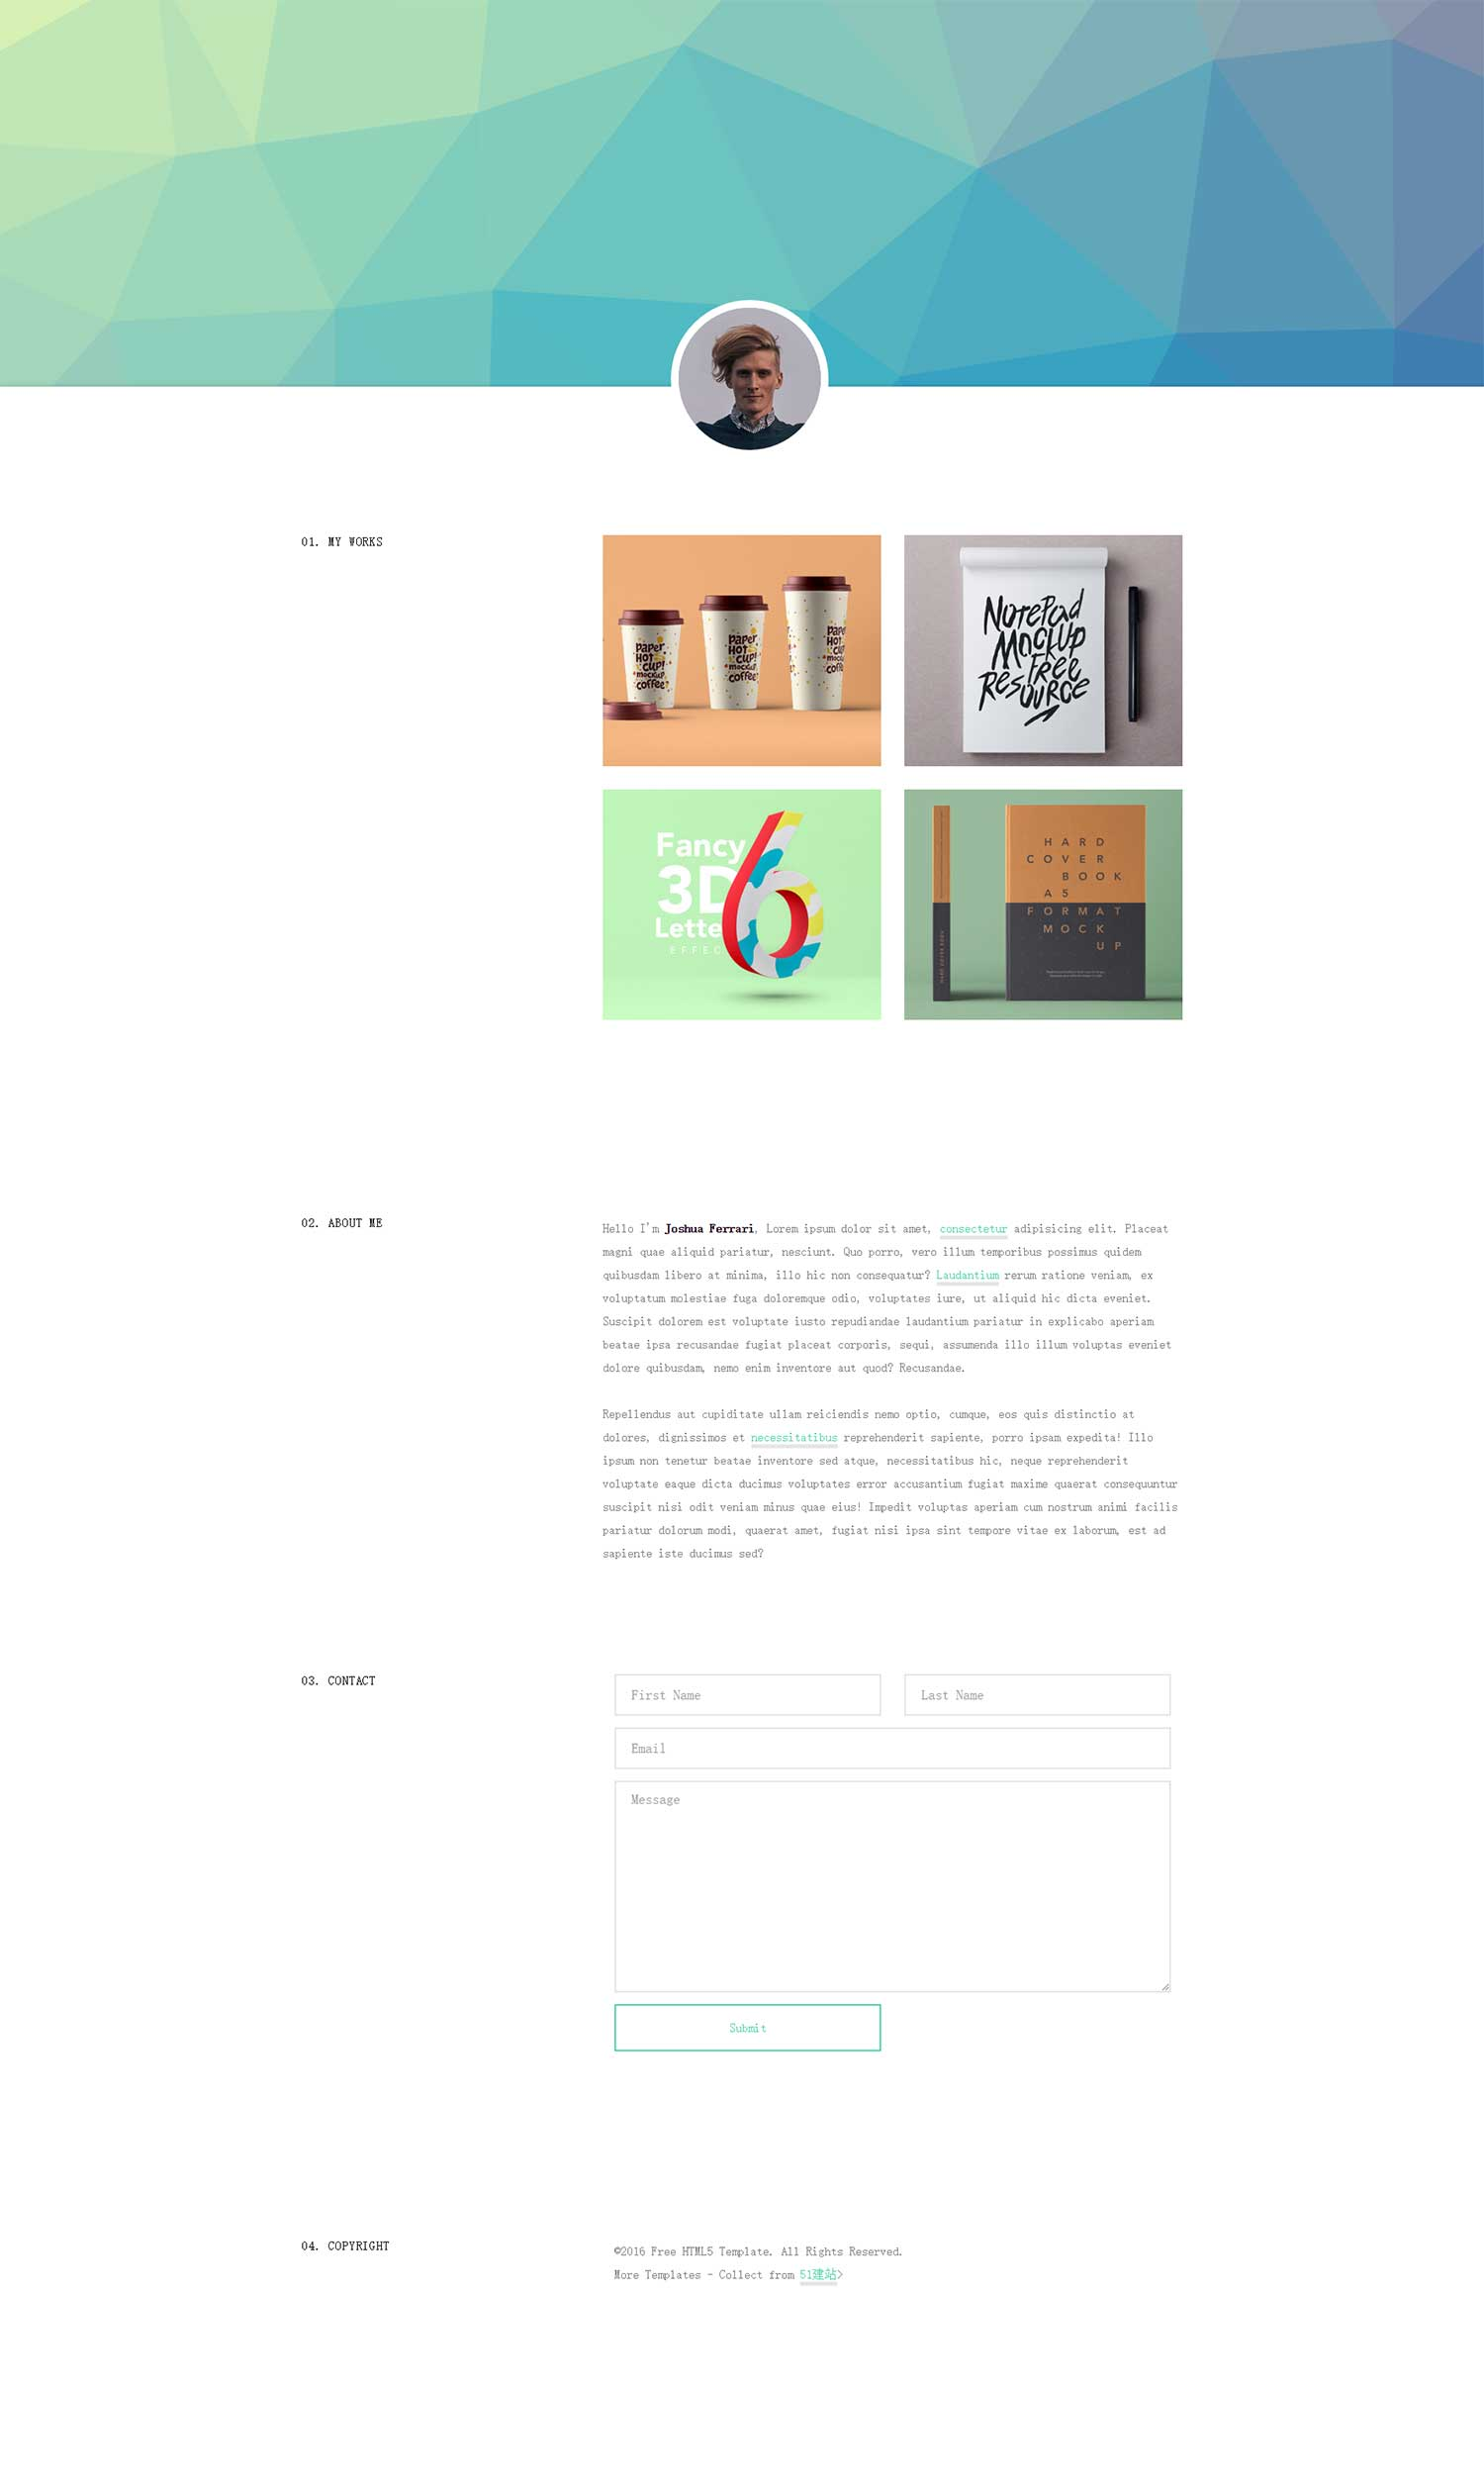 UI设计师个人作品展示web简历简介清新网页博客blog网站模板